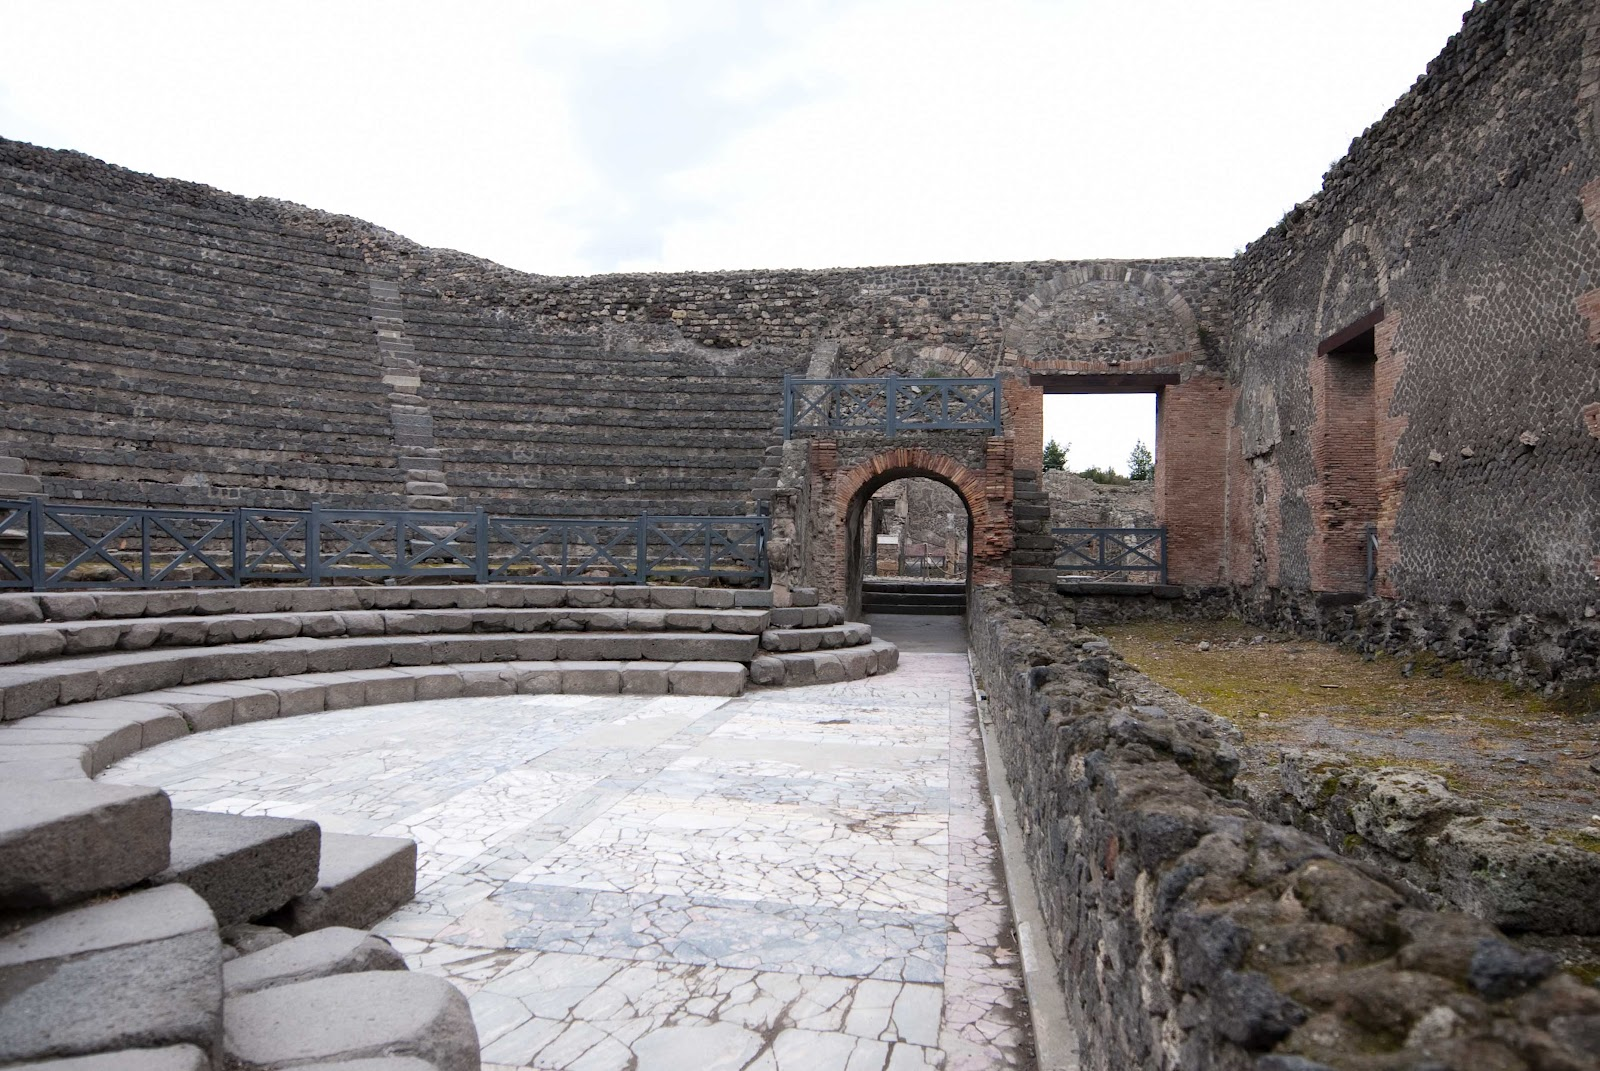 pompeii - photo #28